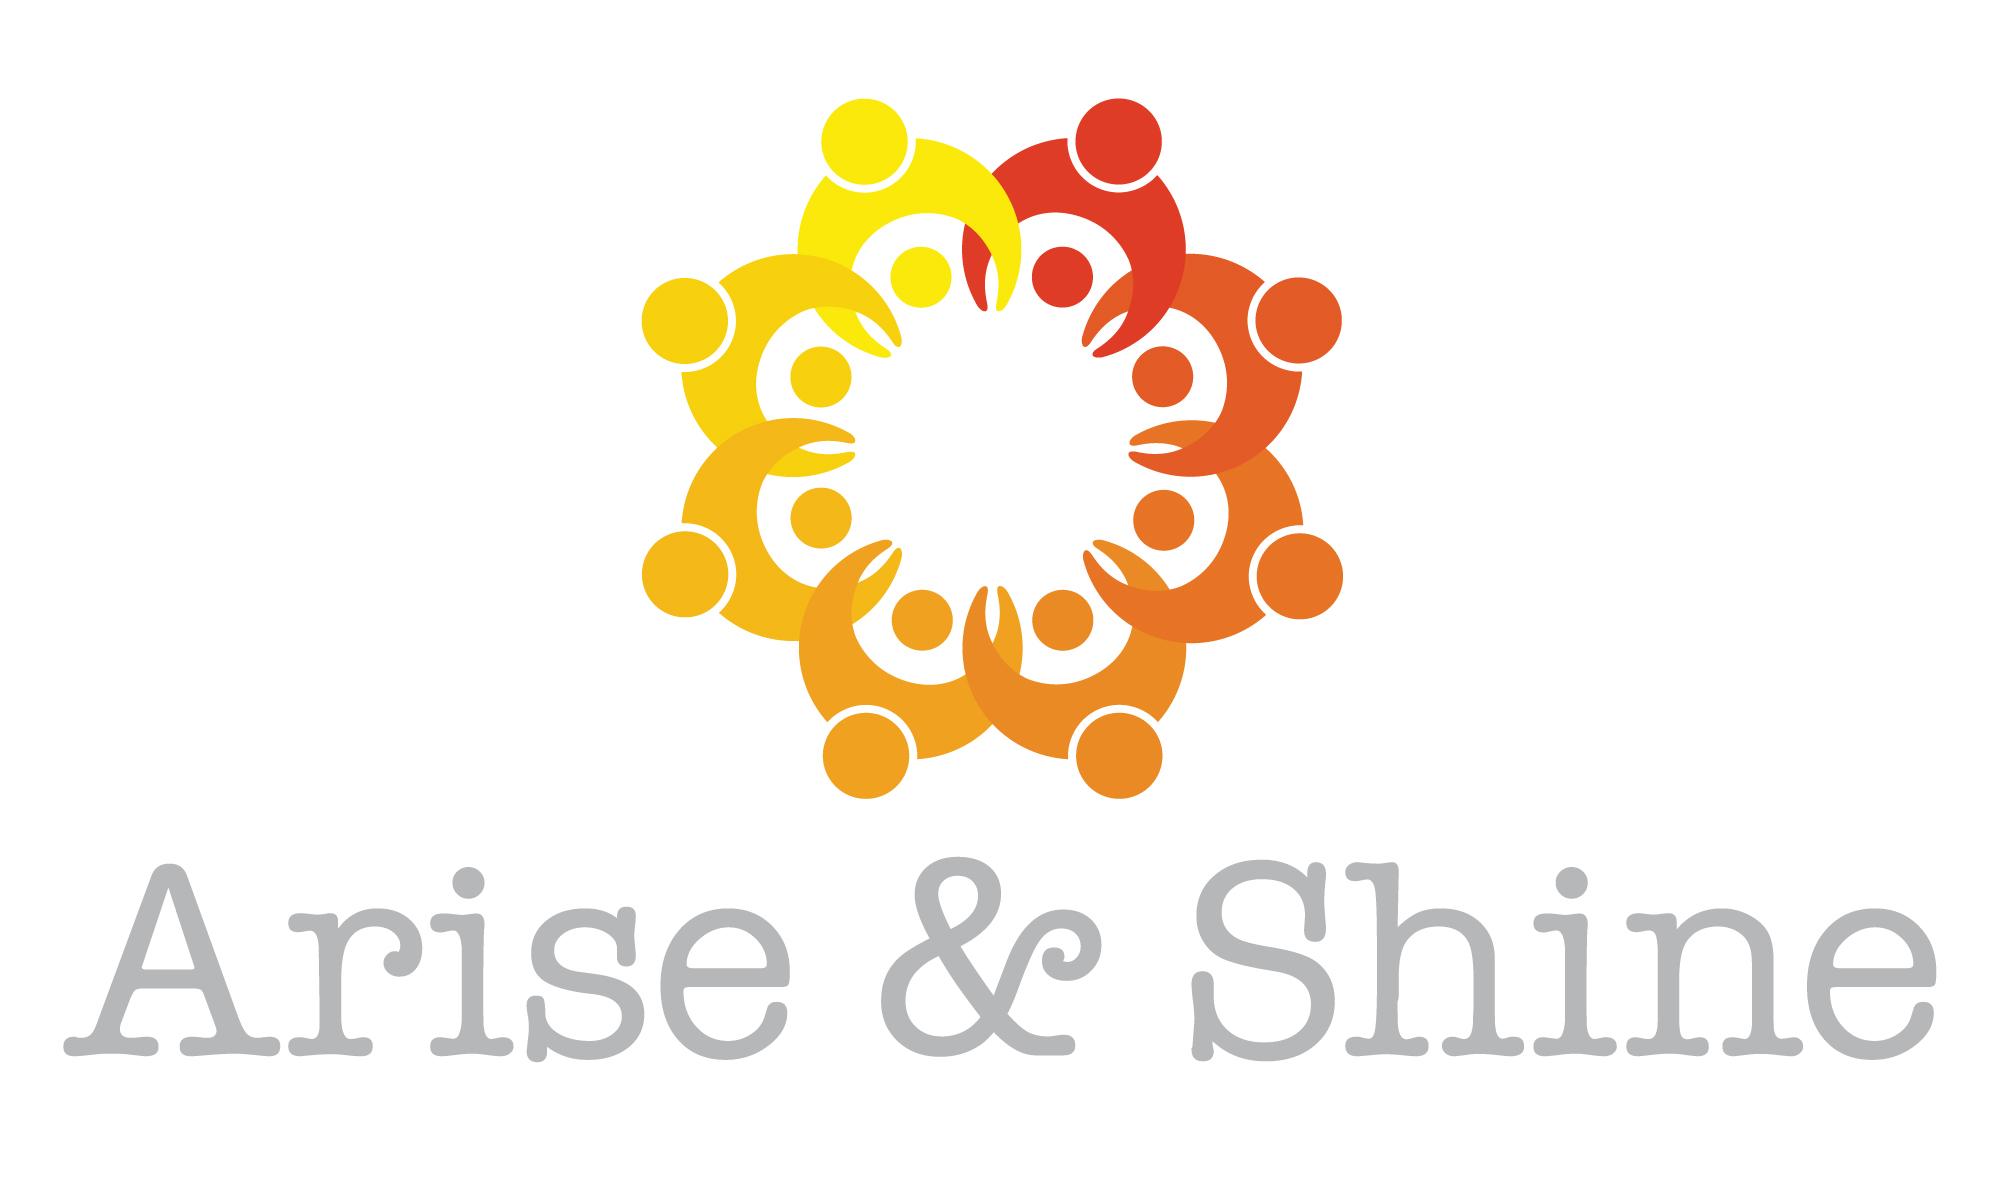 Arise-and-Shine-Uganda.jpg